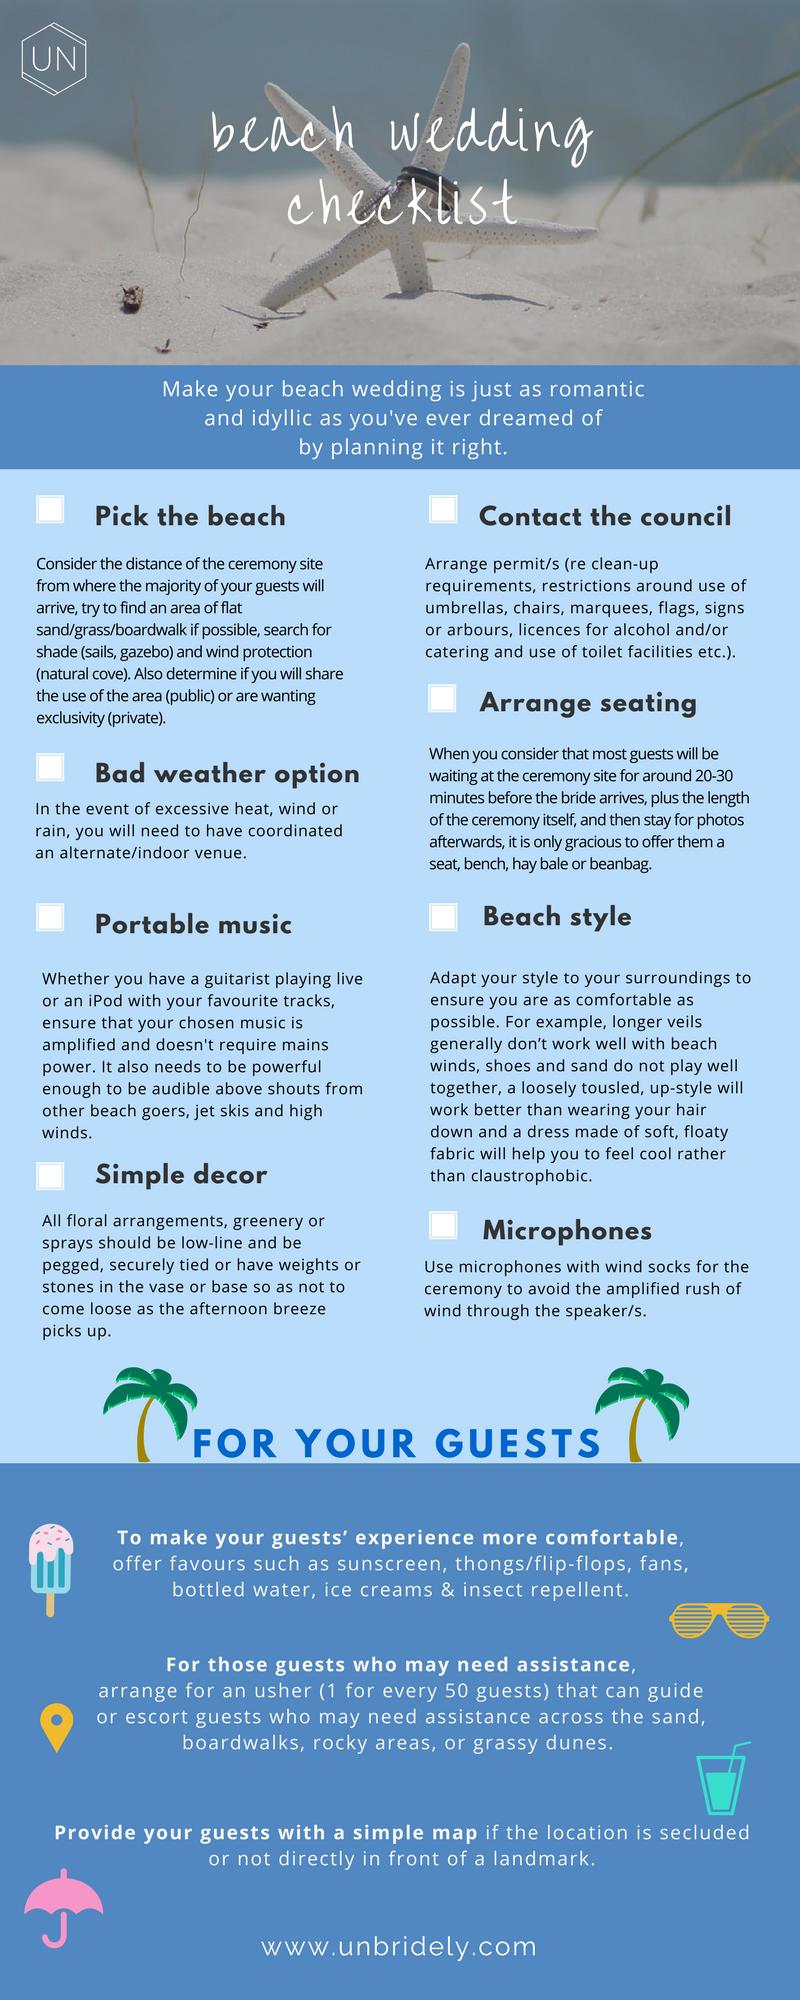 Unbridely  Beach Destination Wedding Checklist  Weddings